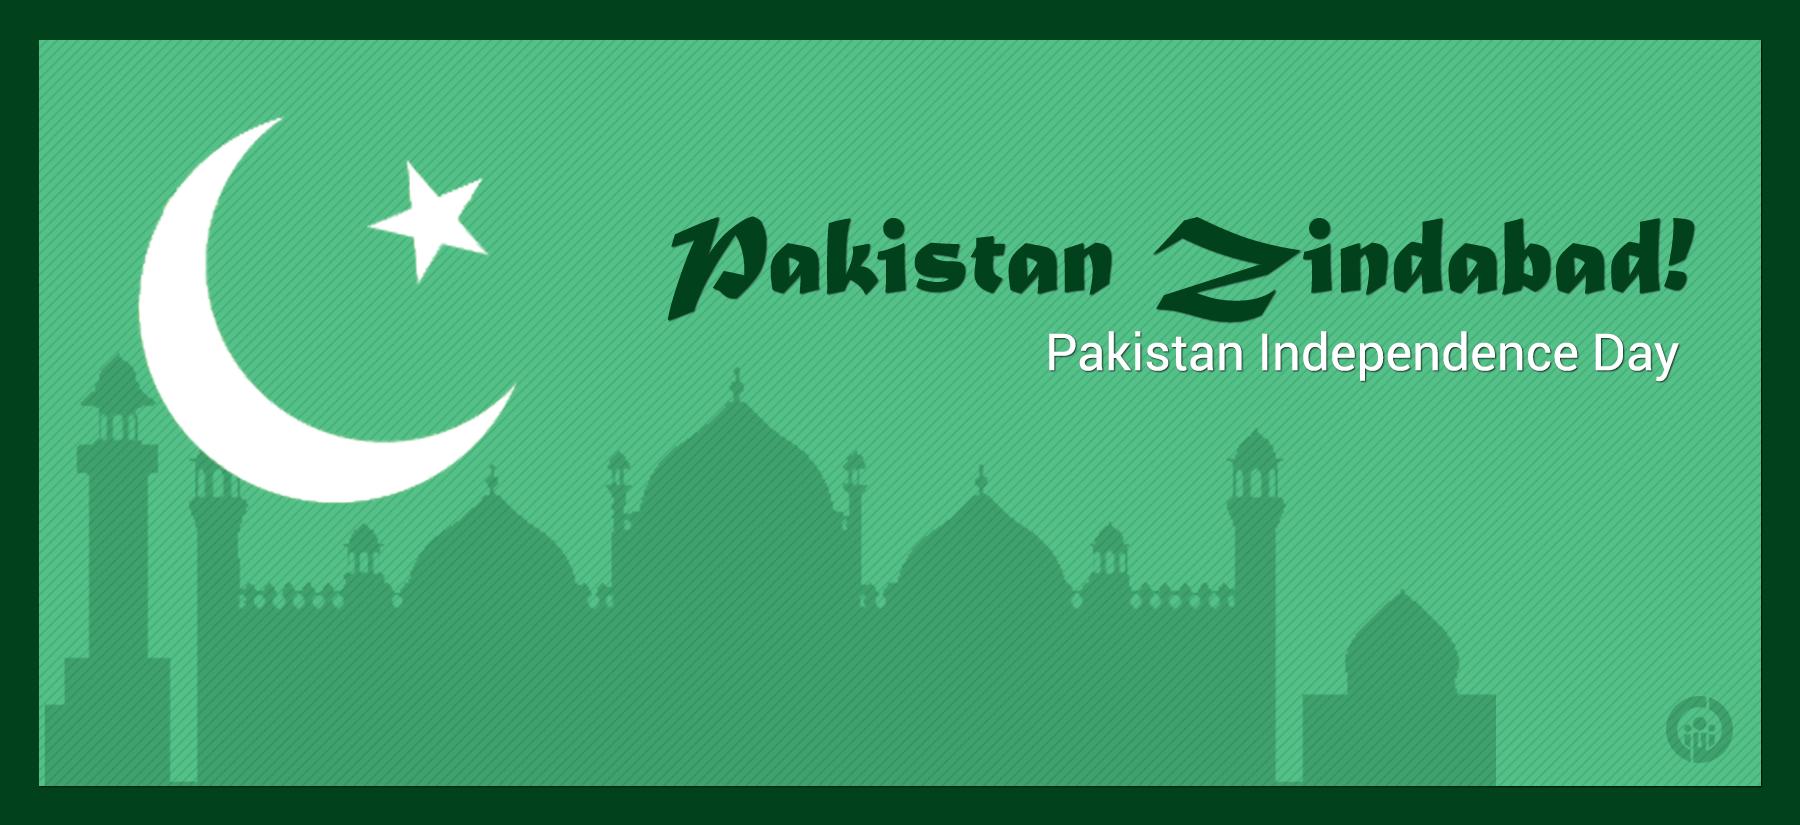 Pakistan Zindabad! Pakistan Independence Day